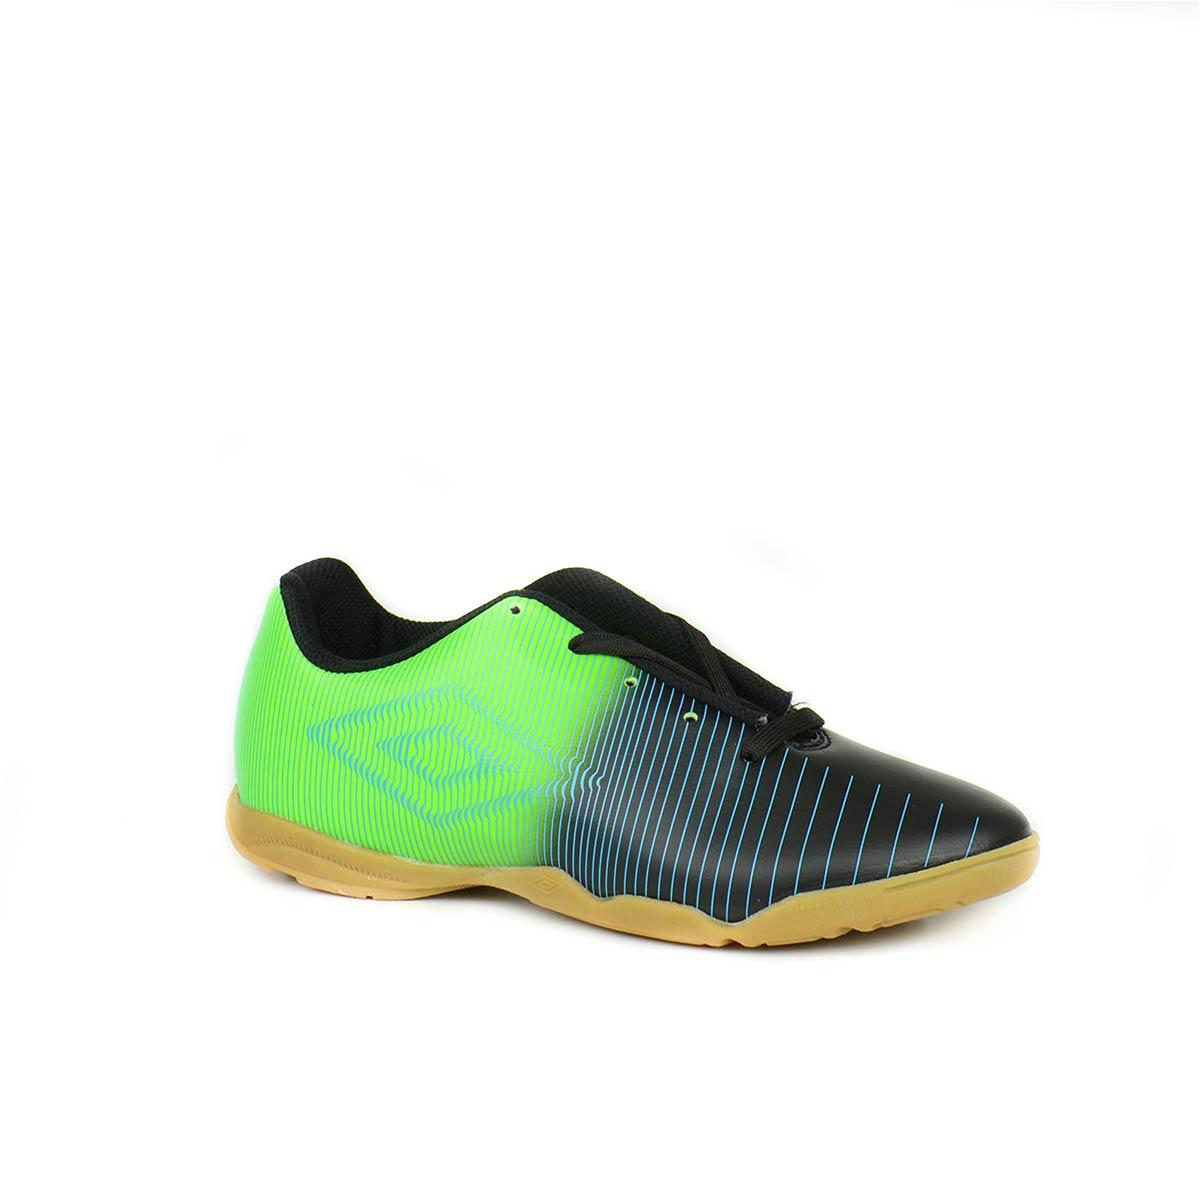 f114badea6 Chuteira Futsal Umbro Preto Verde. Referência  Umbro Vibe Id JR